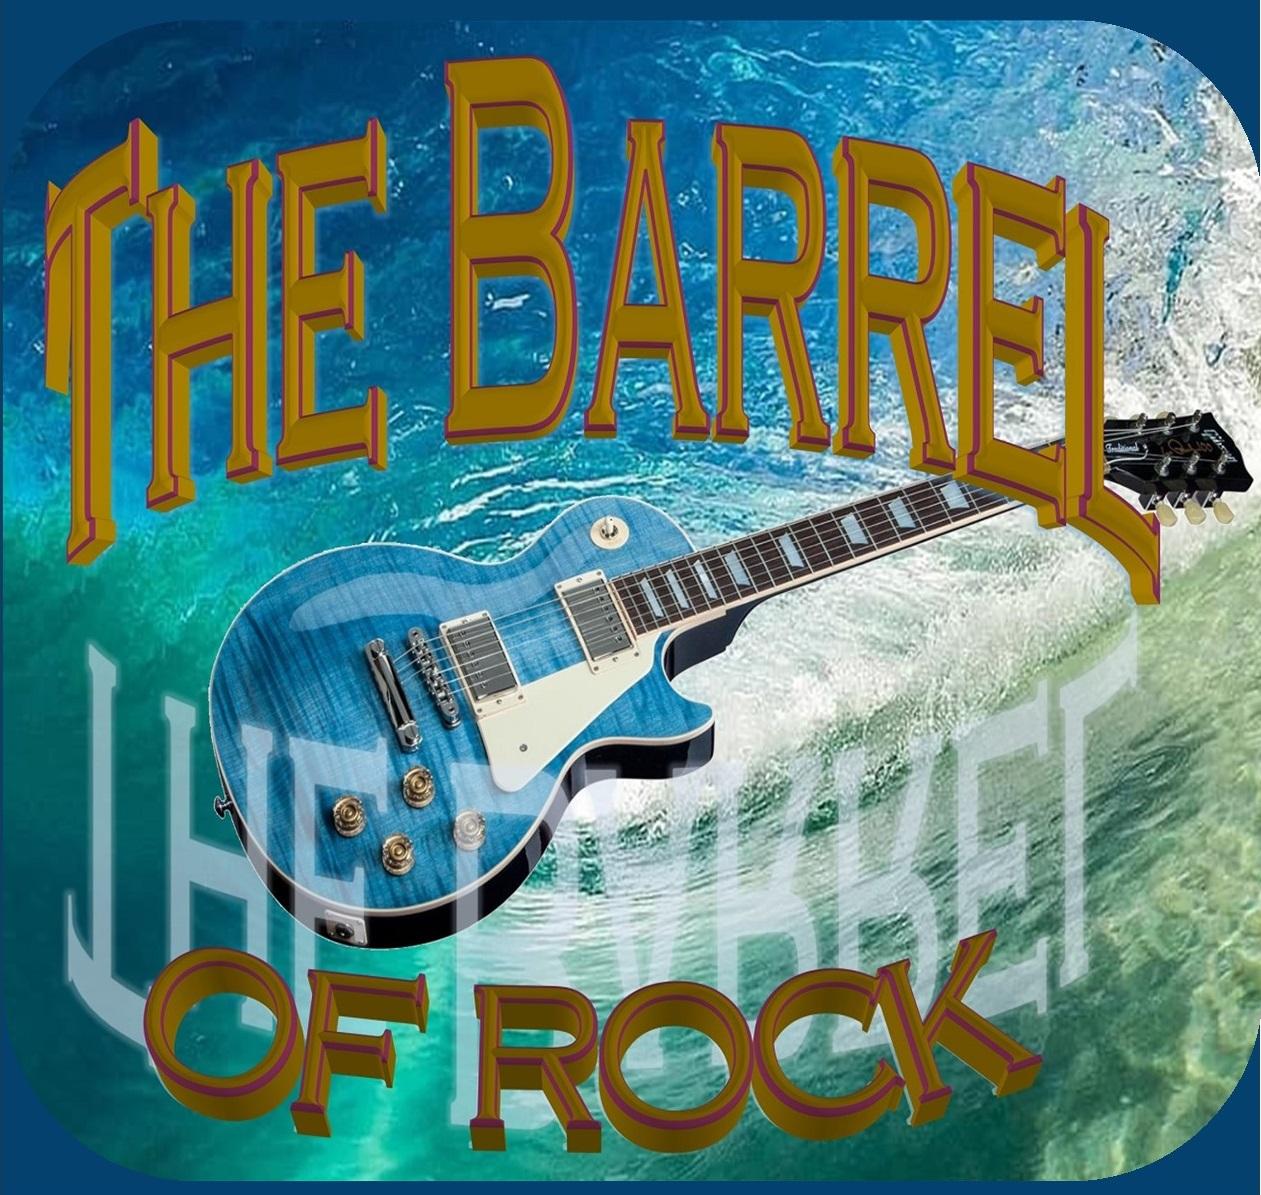 The Barrel of Rock logo